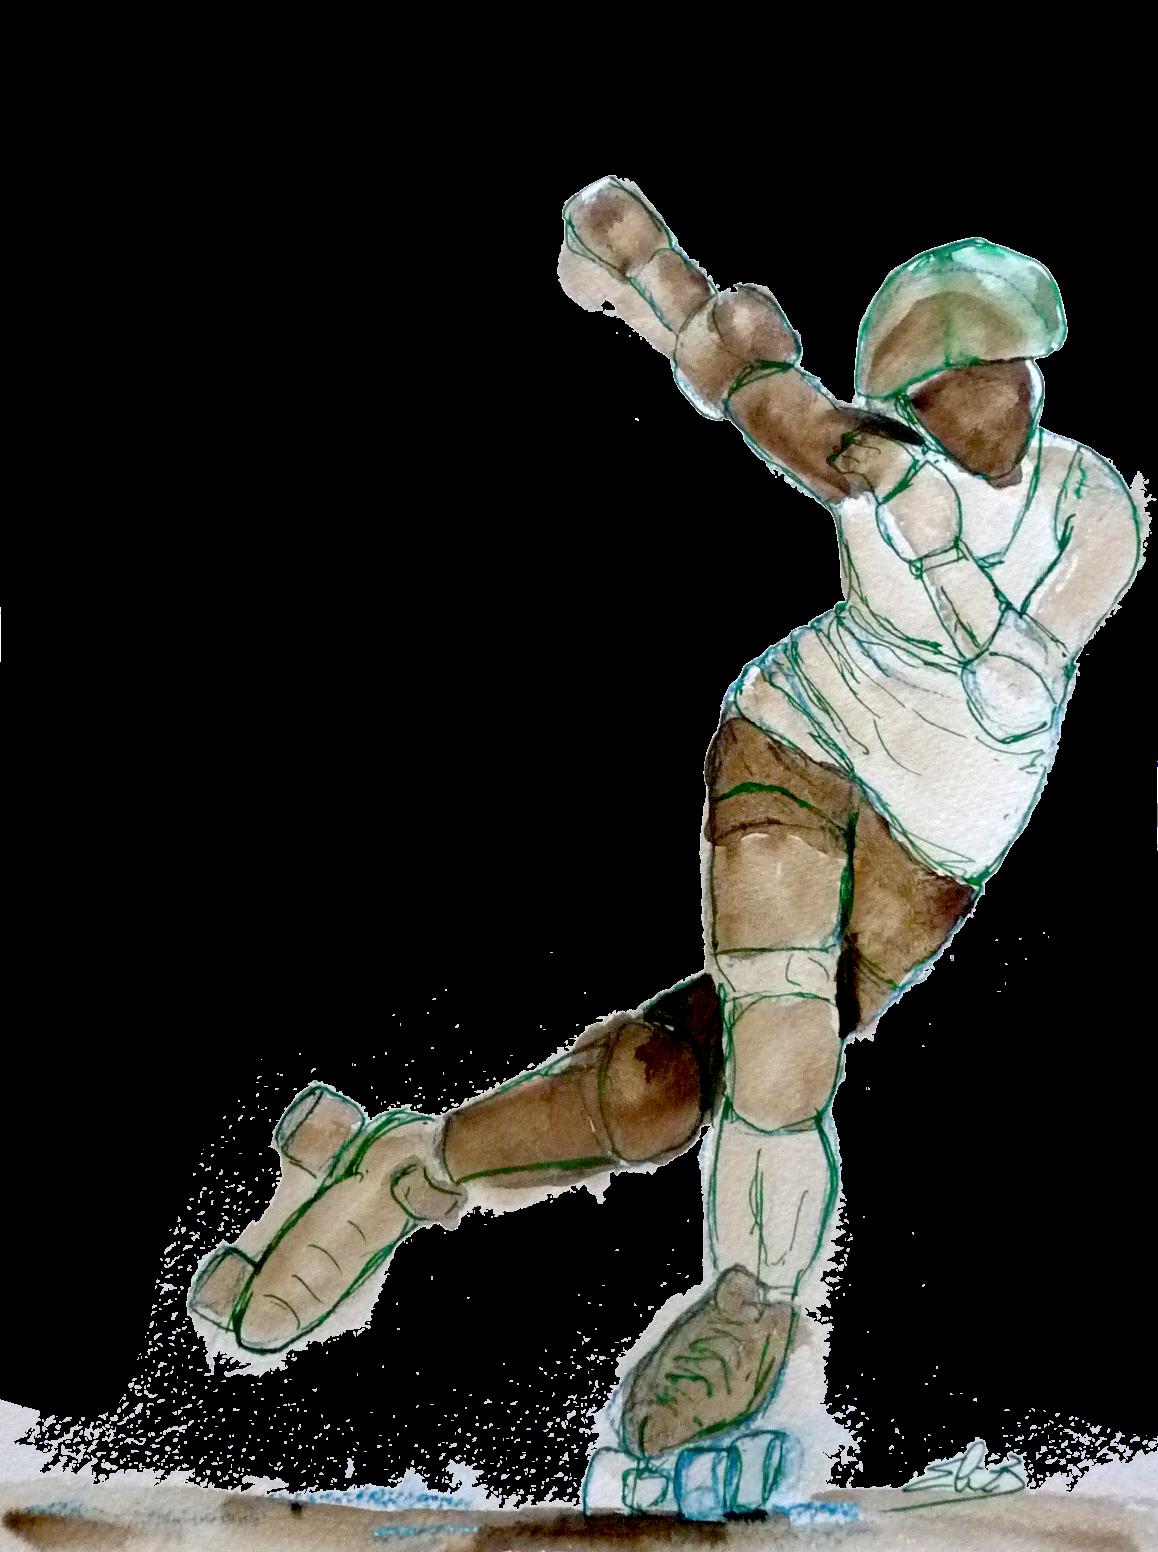 derby roller dessin Elize pigmentropie sport féminin